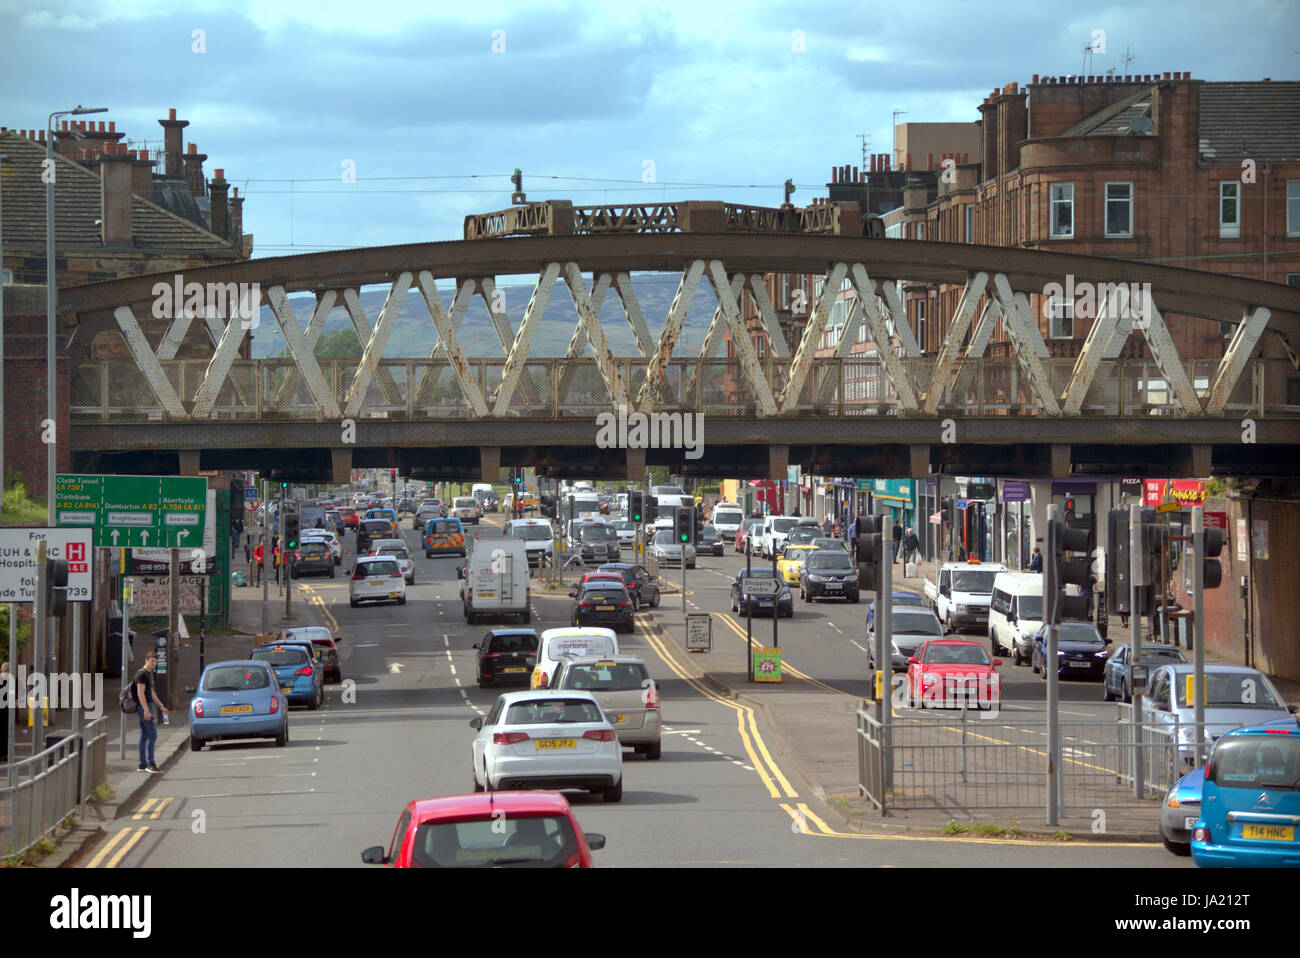 Great Western Road railway station bridge at Anniesland Cross Glasgow Scotland street scene high viewpoint - Stock Image